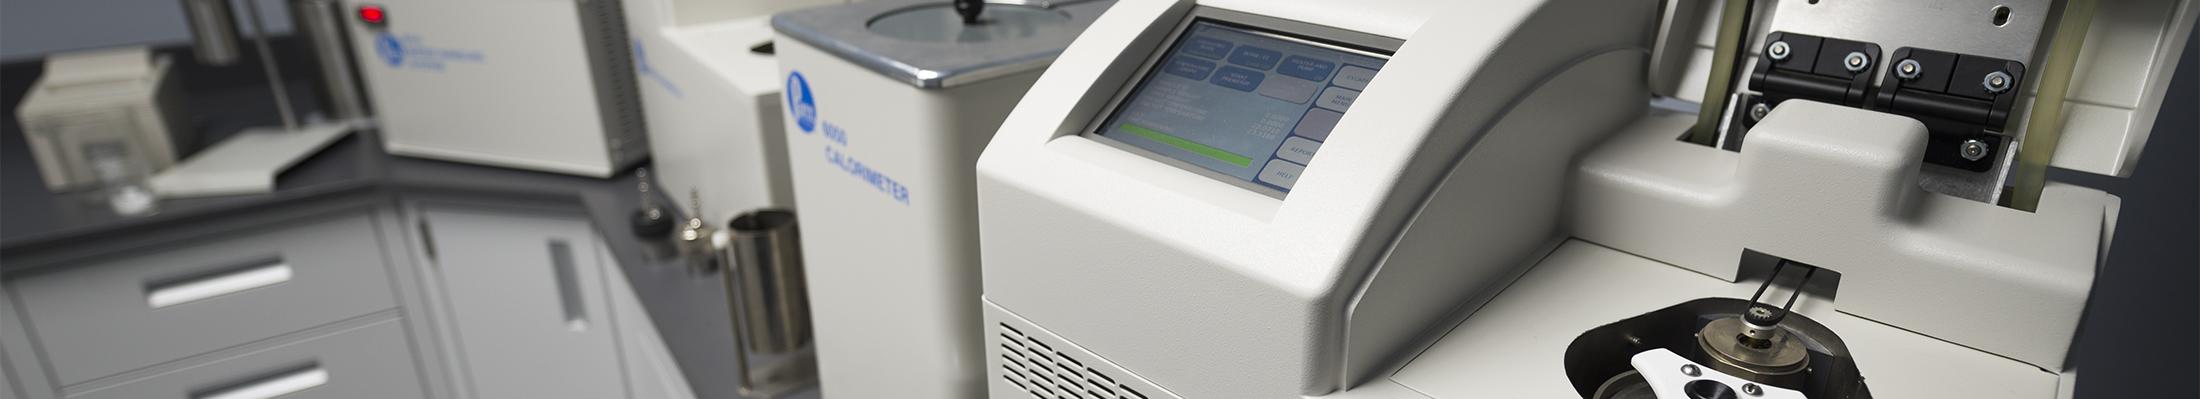 Oxygen Bomb Calorimeters Parr Instrument Company Secondary Ignition Wiring Diagram Pickup